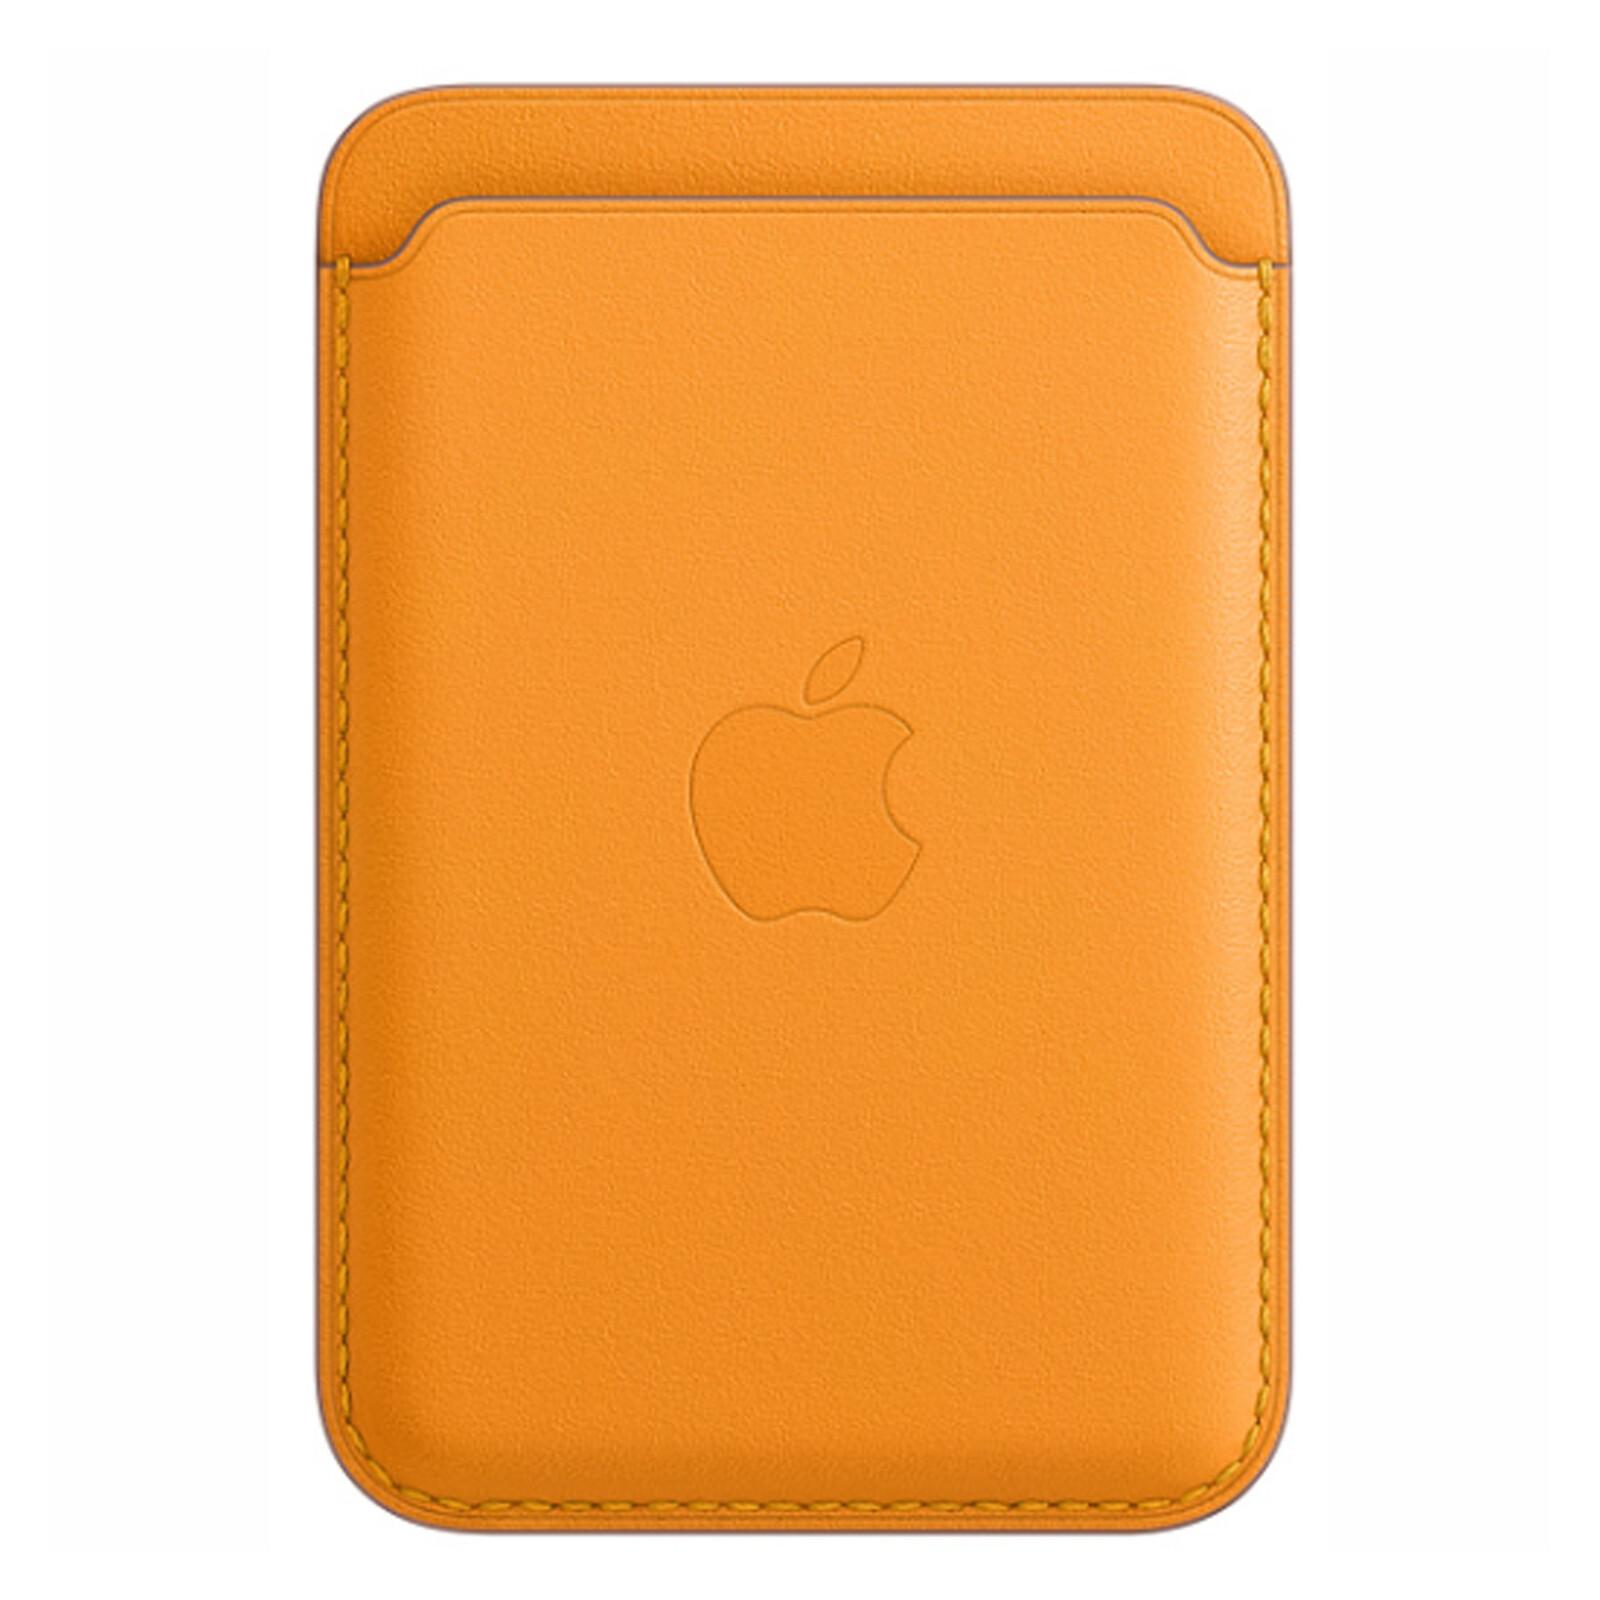 Apple iPhone Leder Wallet mit MagSafe california poppy